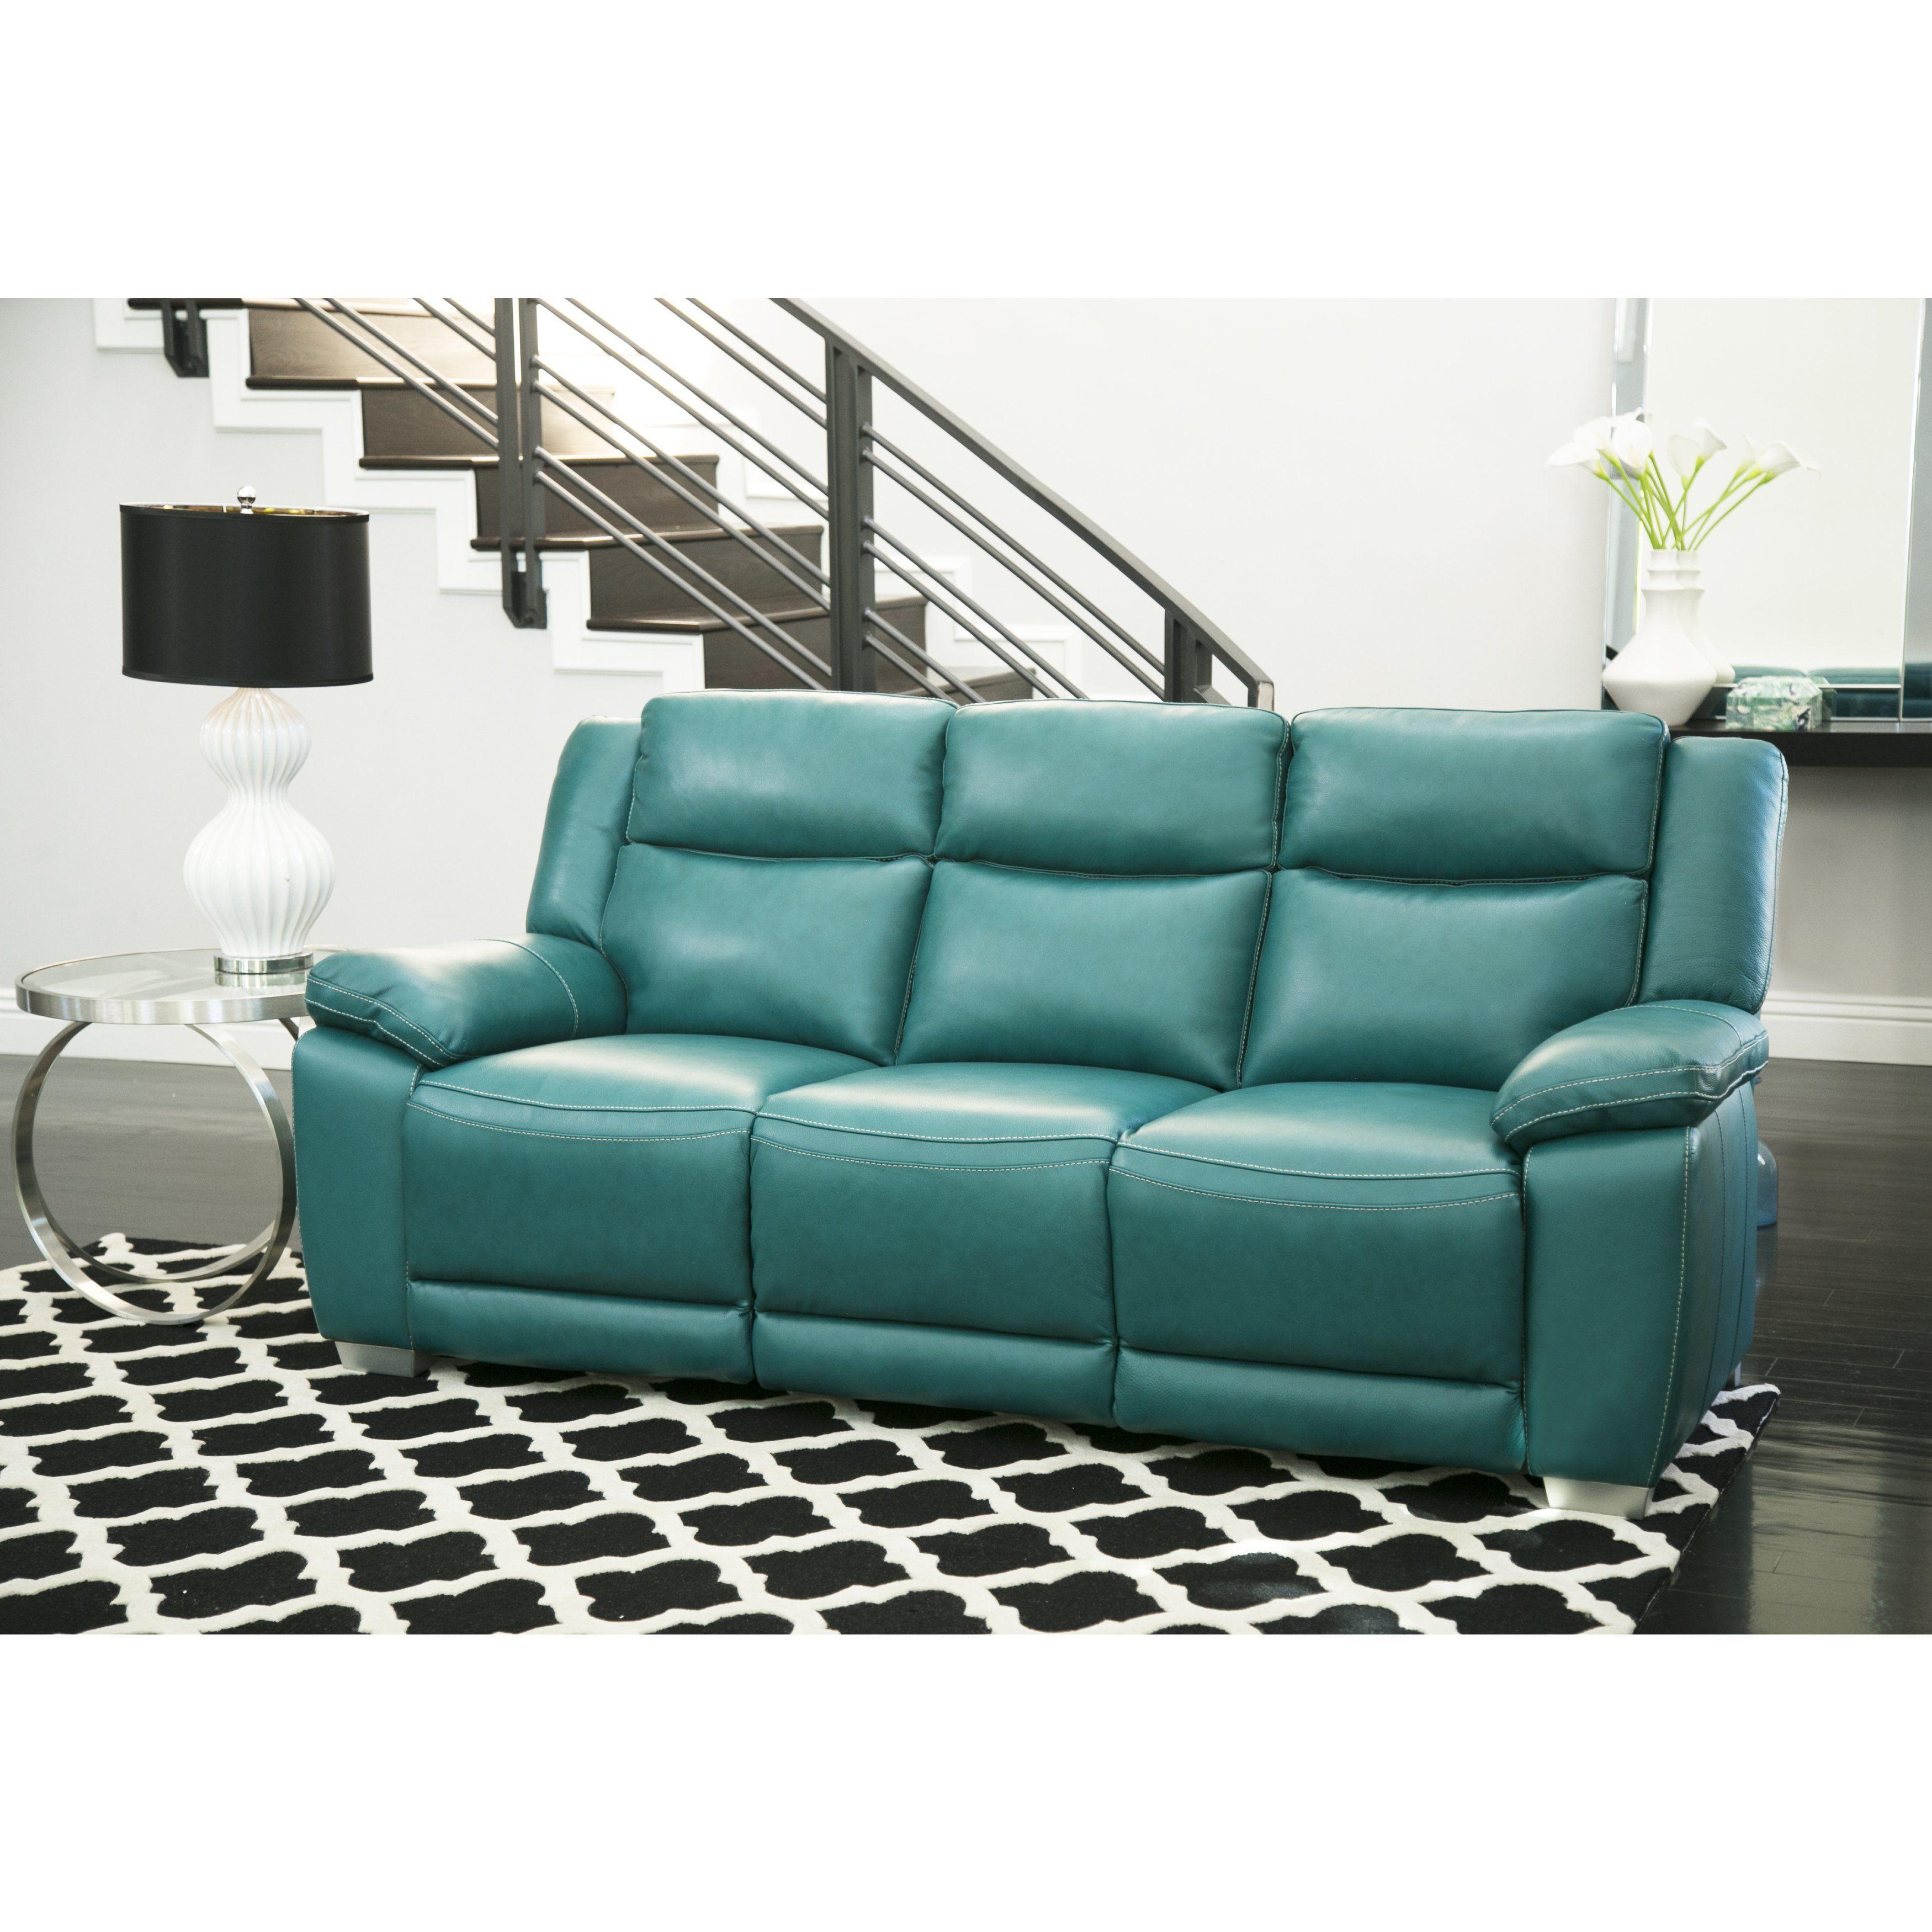 Best Abbyson Leyla Turquoise Top Grain Leather Push Back 400 x 300